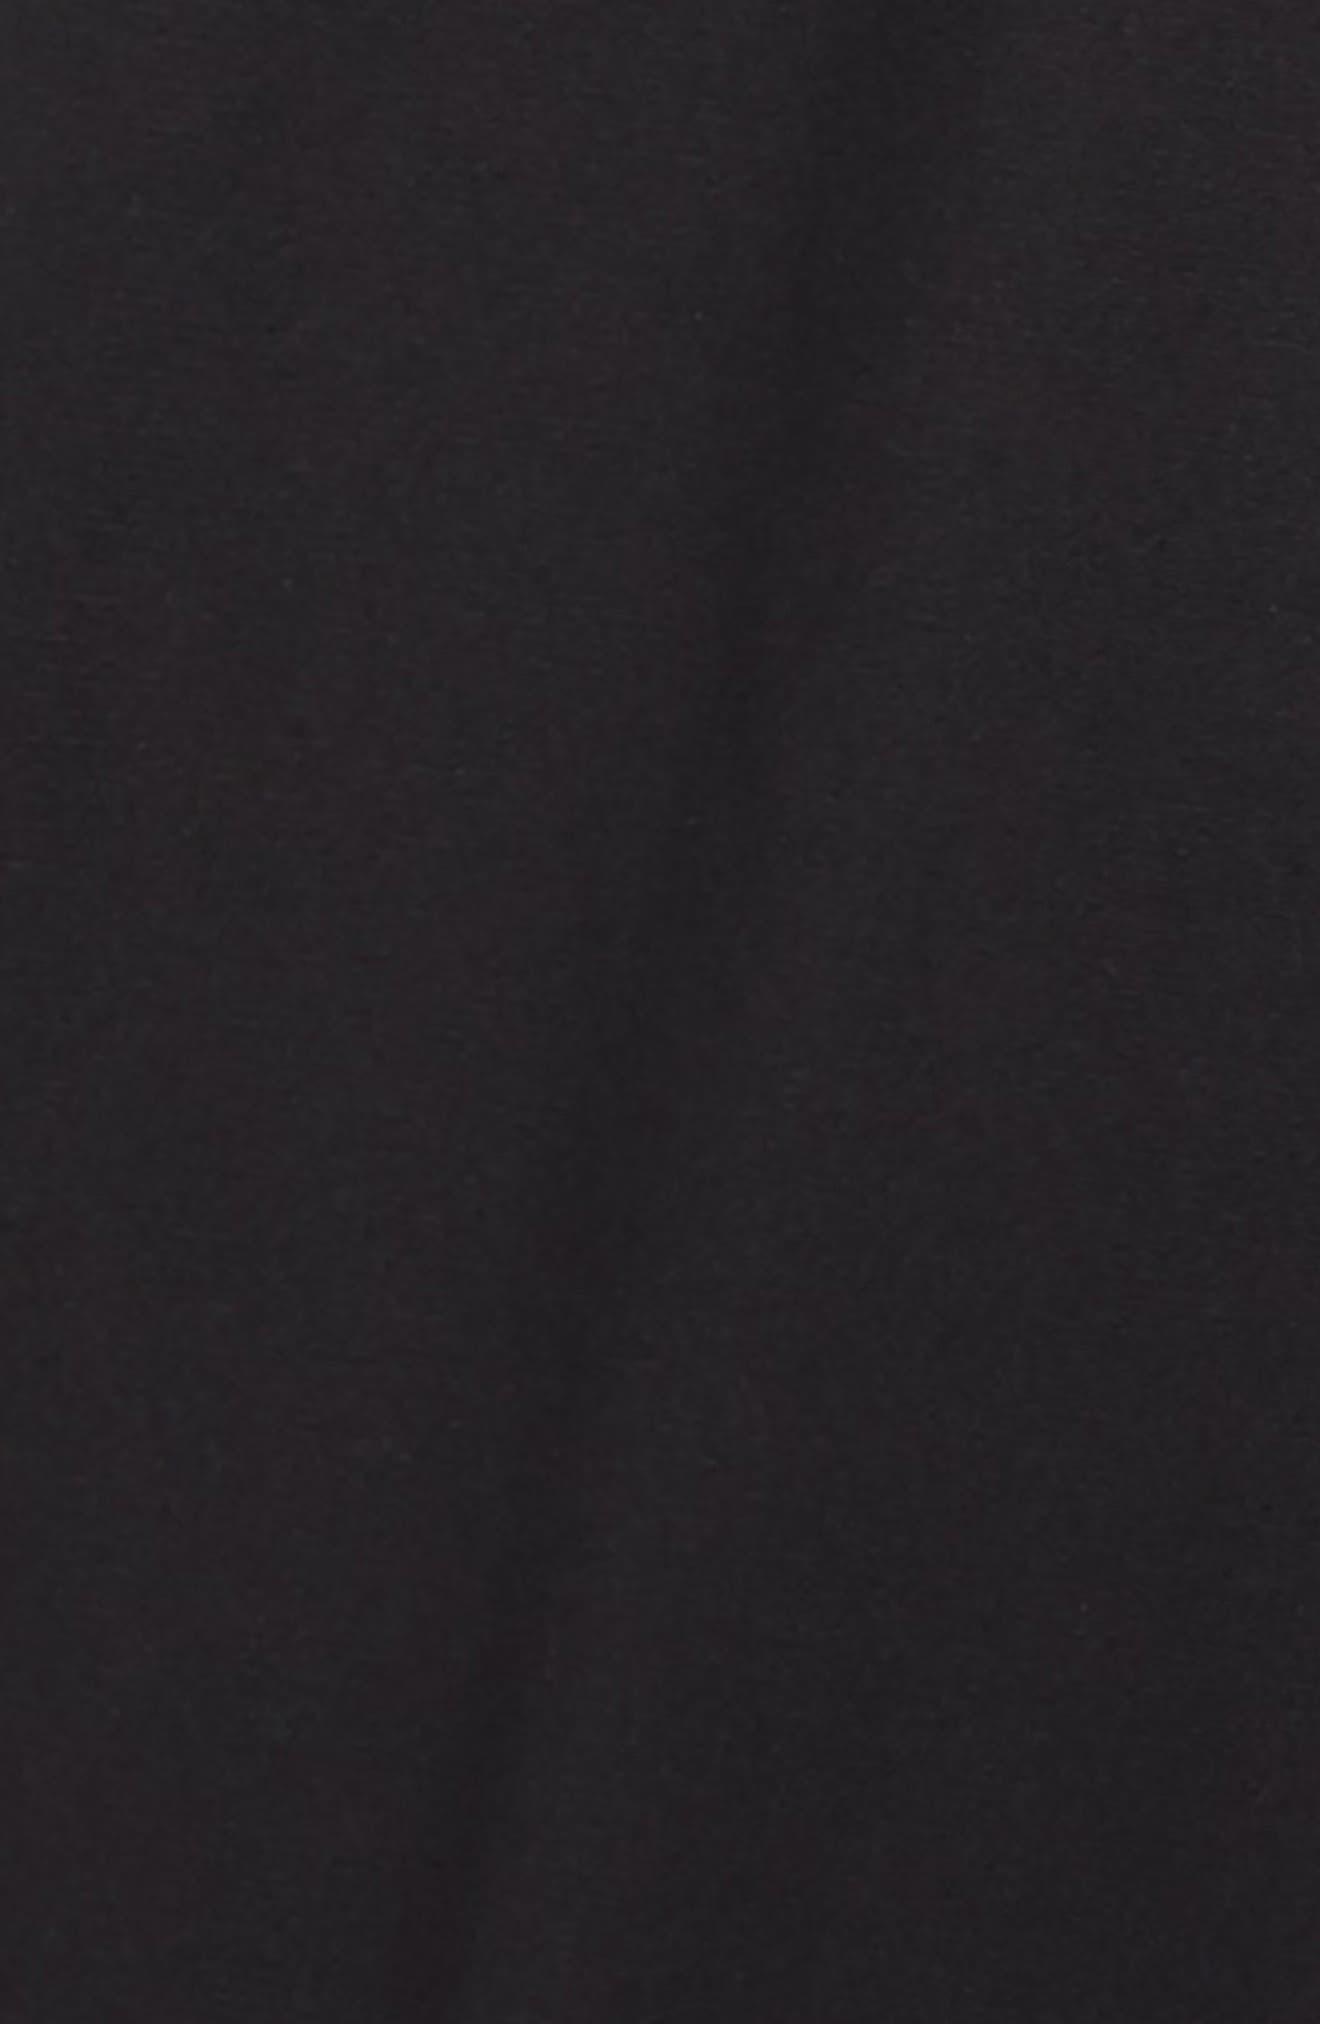 UNDER ARMOUR,                             Brawler Slim Sweatpants,                             Alternate thumbnail 3, color,                             001